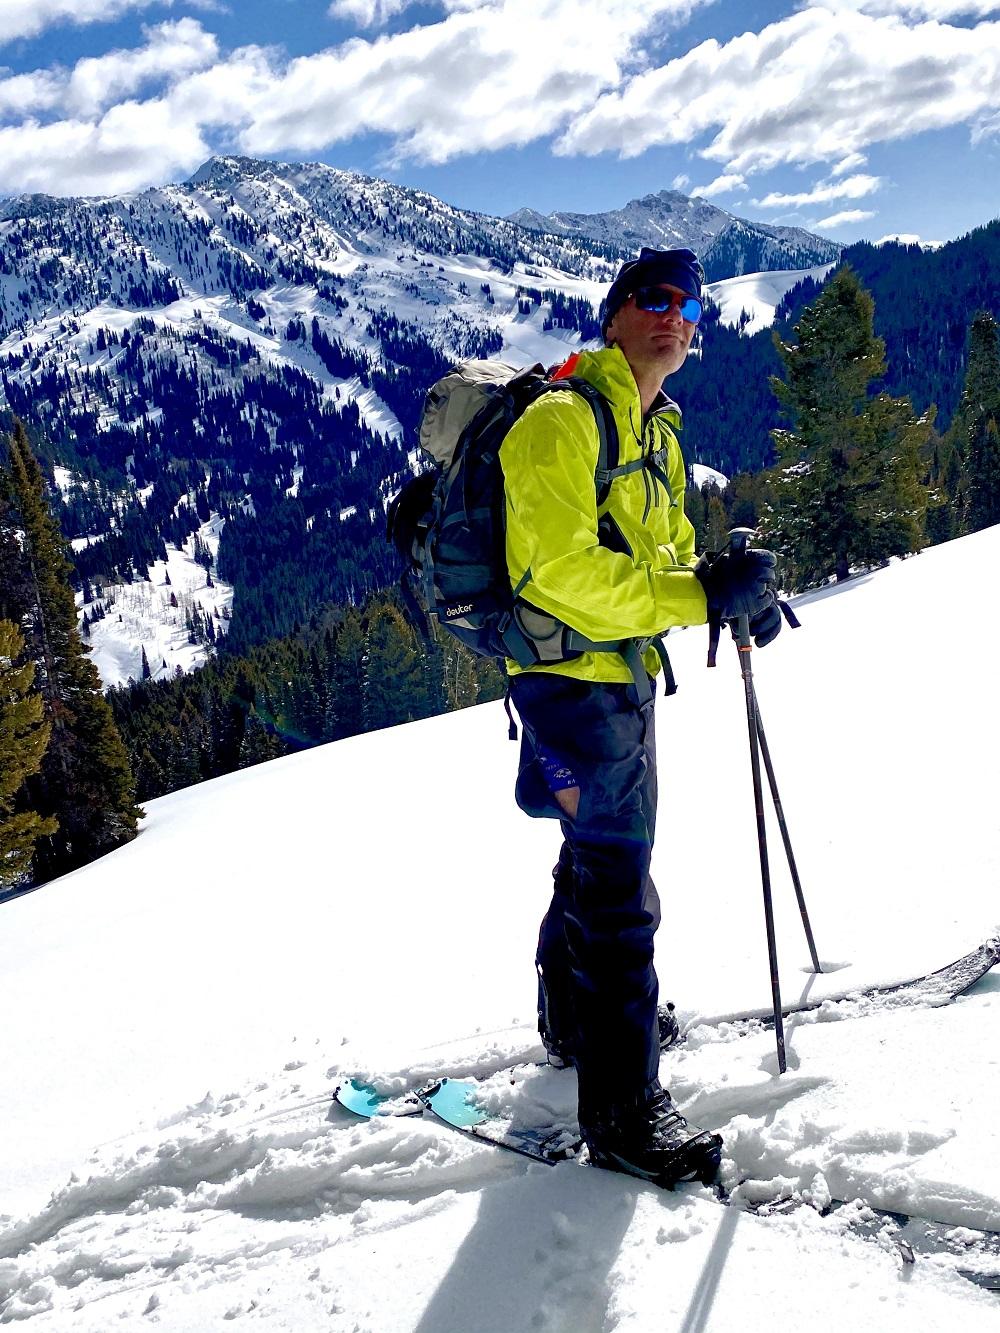 Costa Del Mar Reefton Sunglasses Test Skiing in Teton Mountains